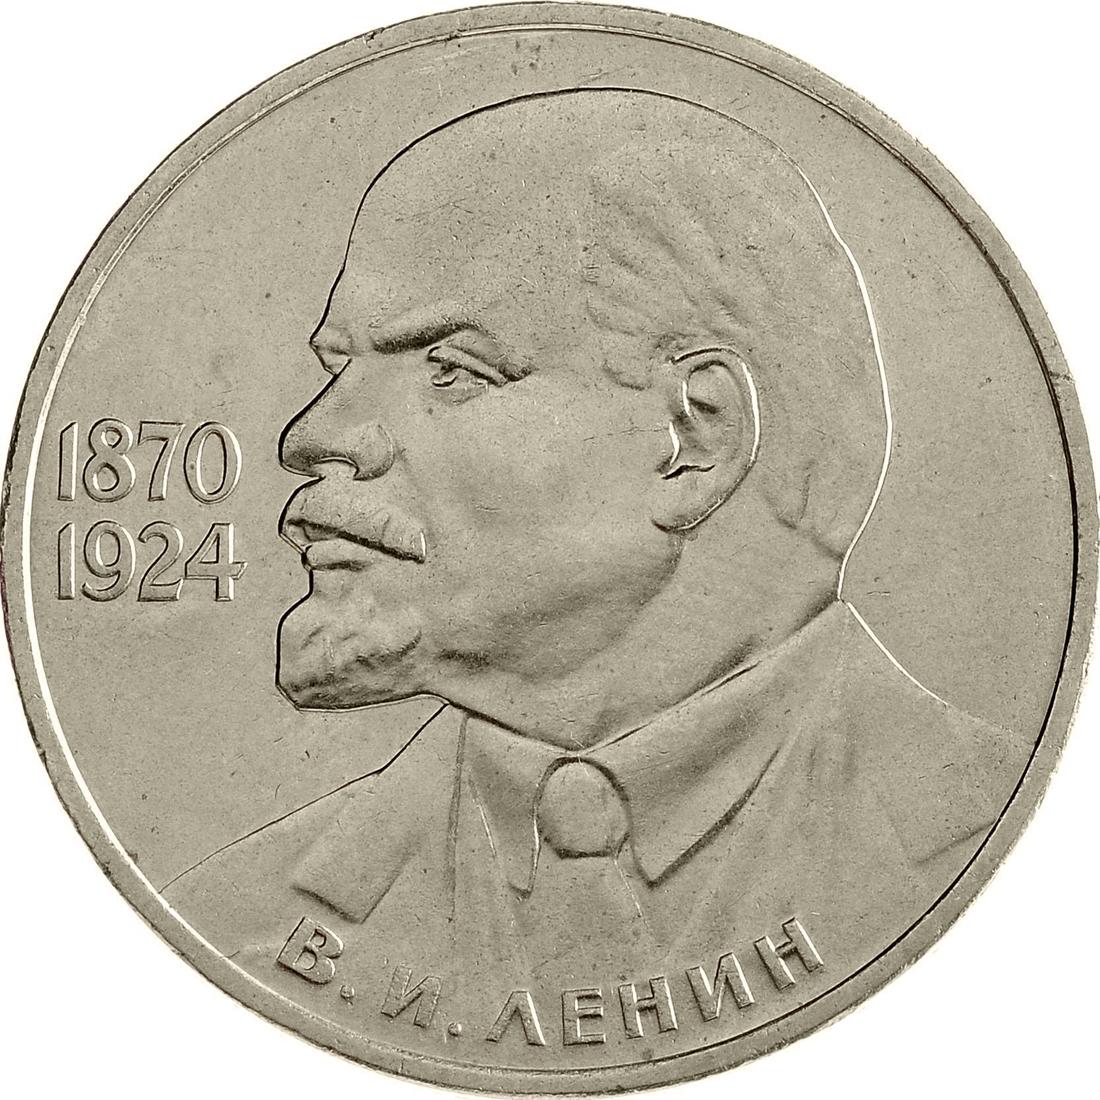 Russia USSR commemorative coin 1 rouble 1985 Vladimir Lenin 115th of birth